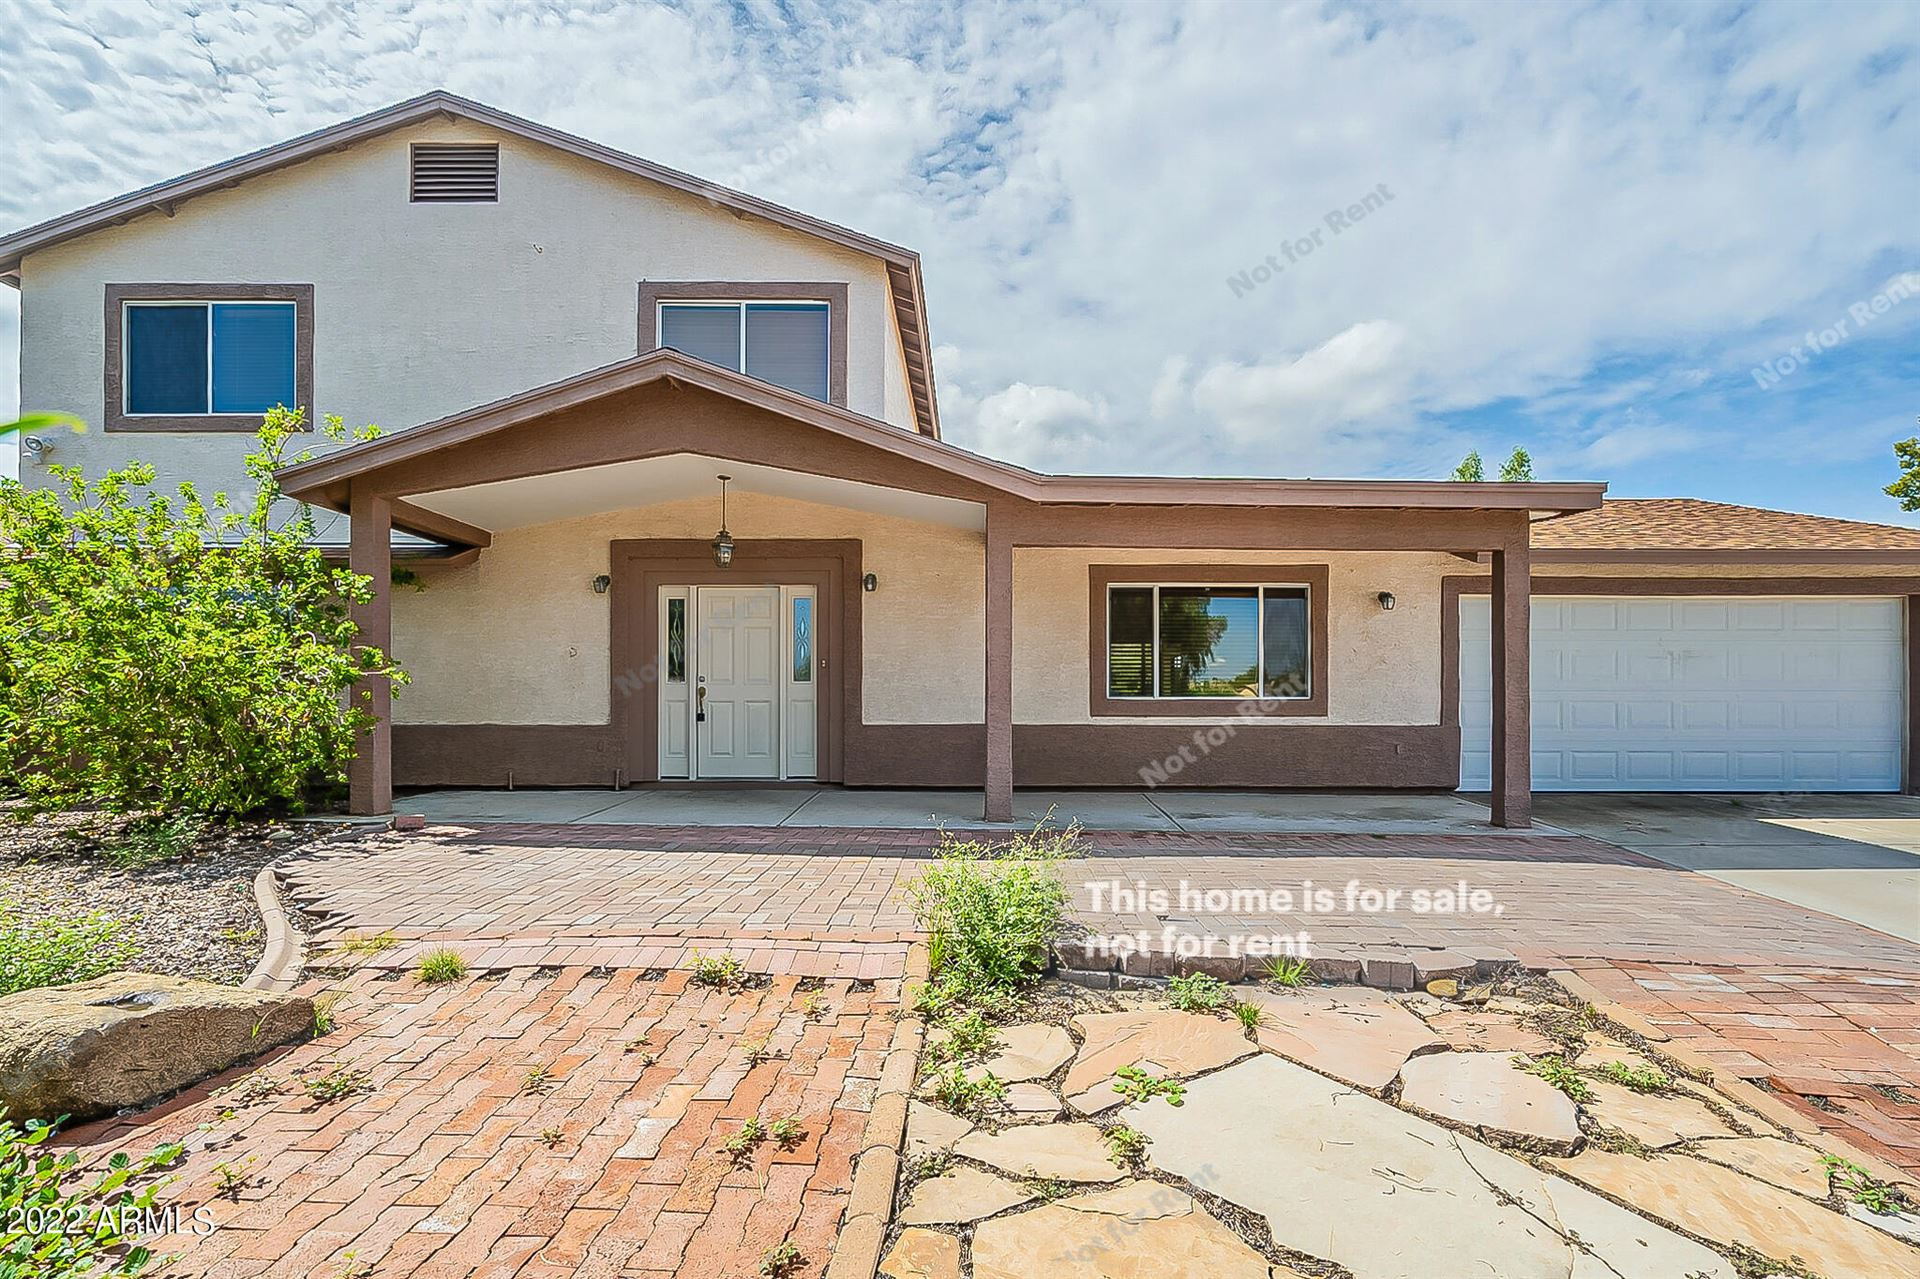 1817 E PARADISE Lane, Phoenix, AZ 85022 - MLS#: 6280240